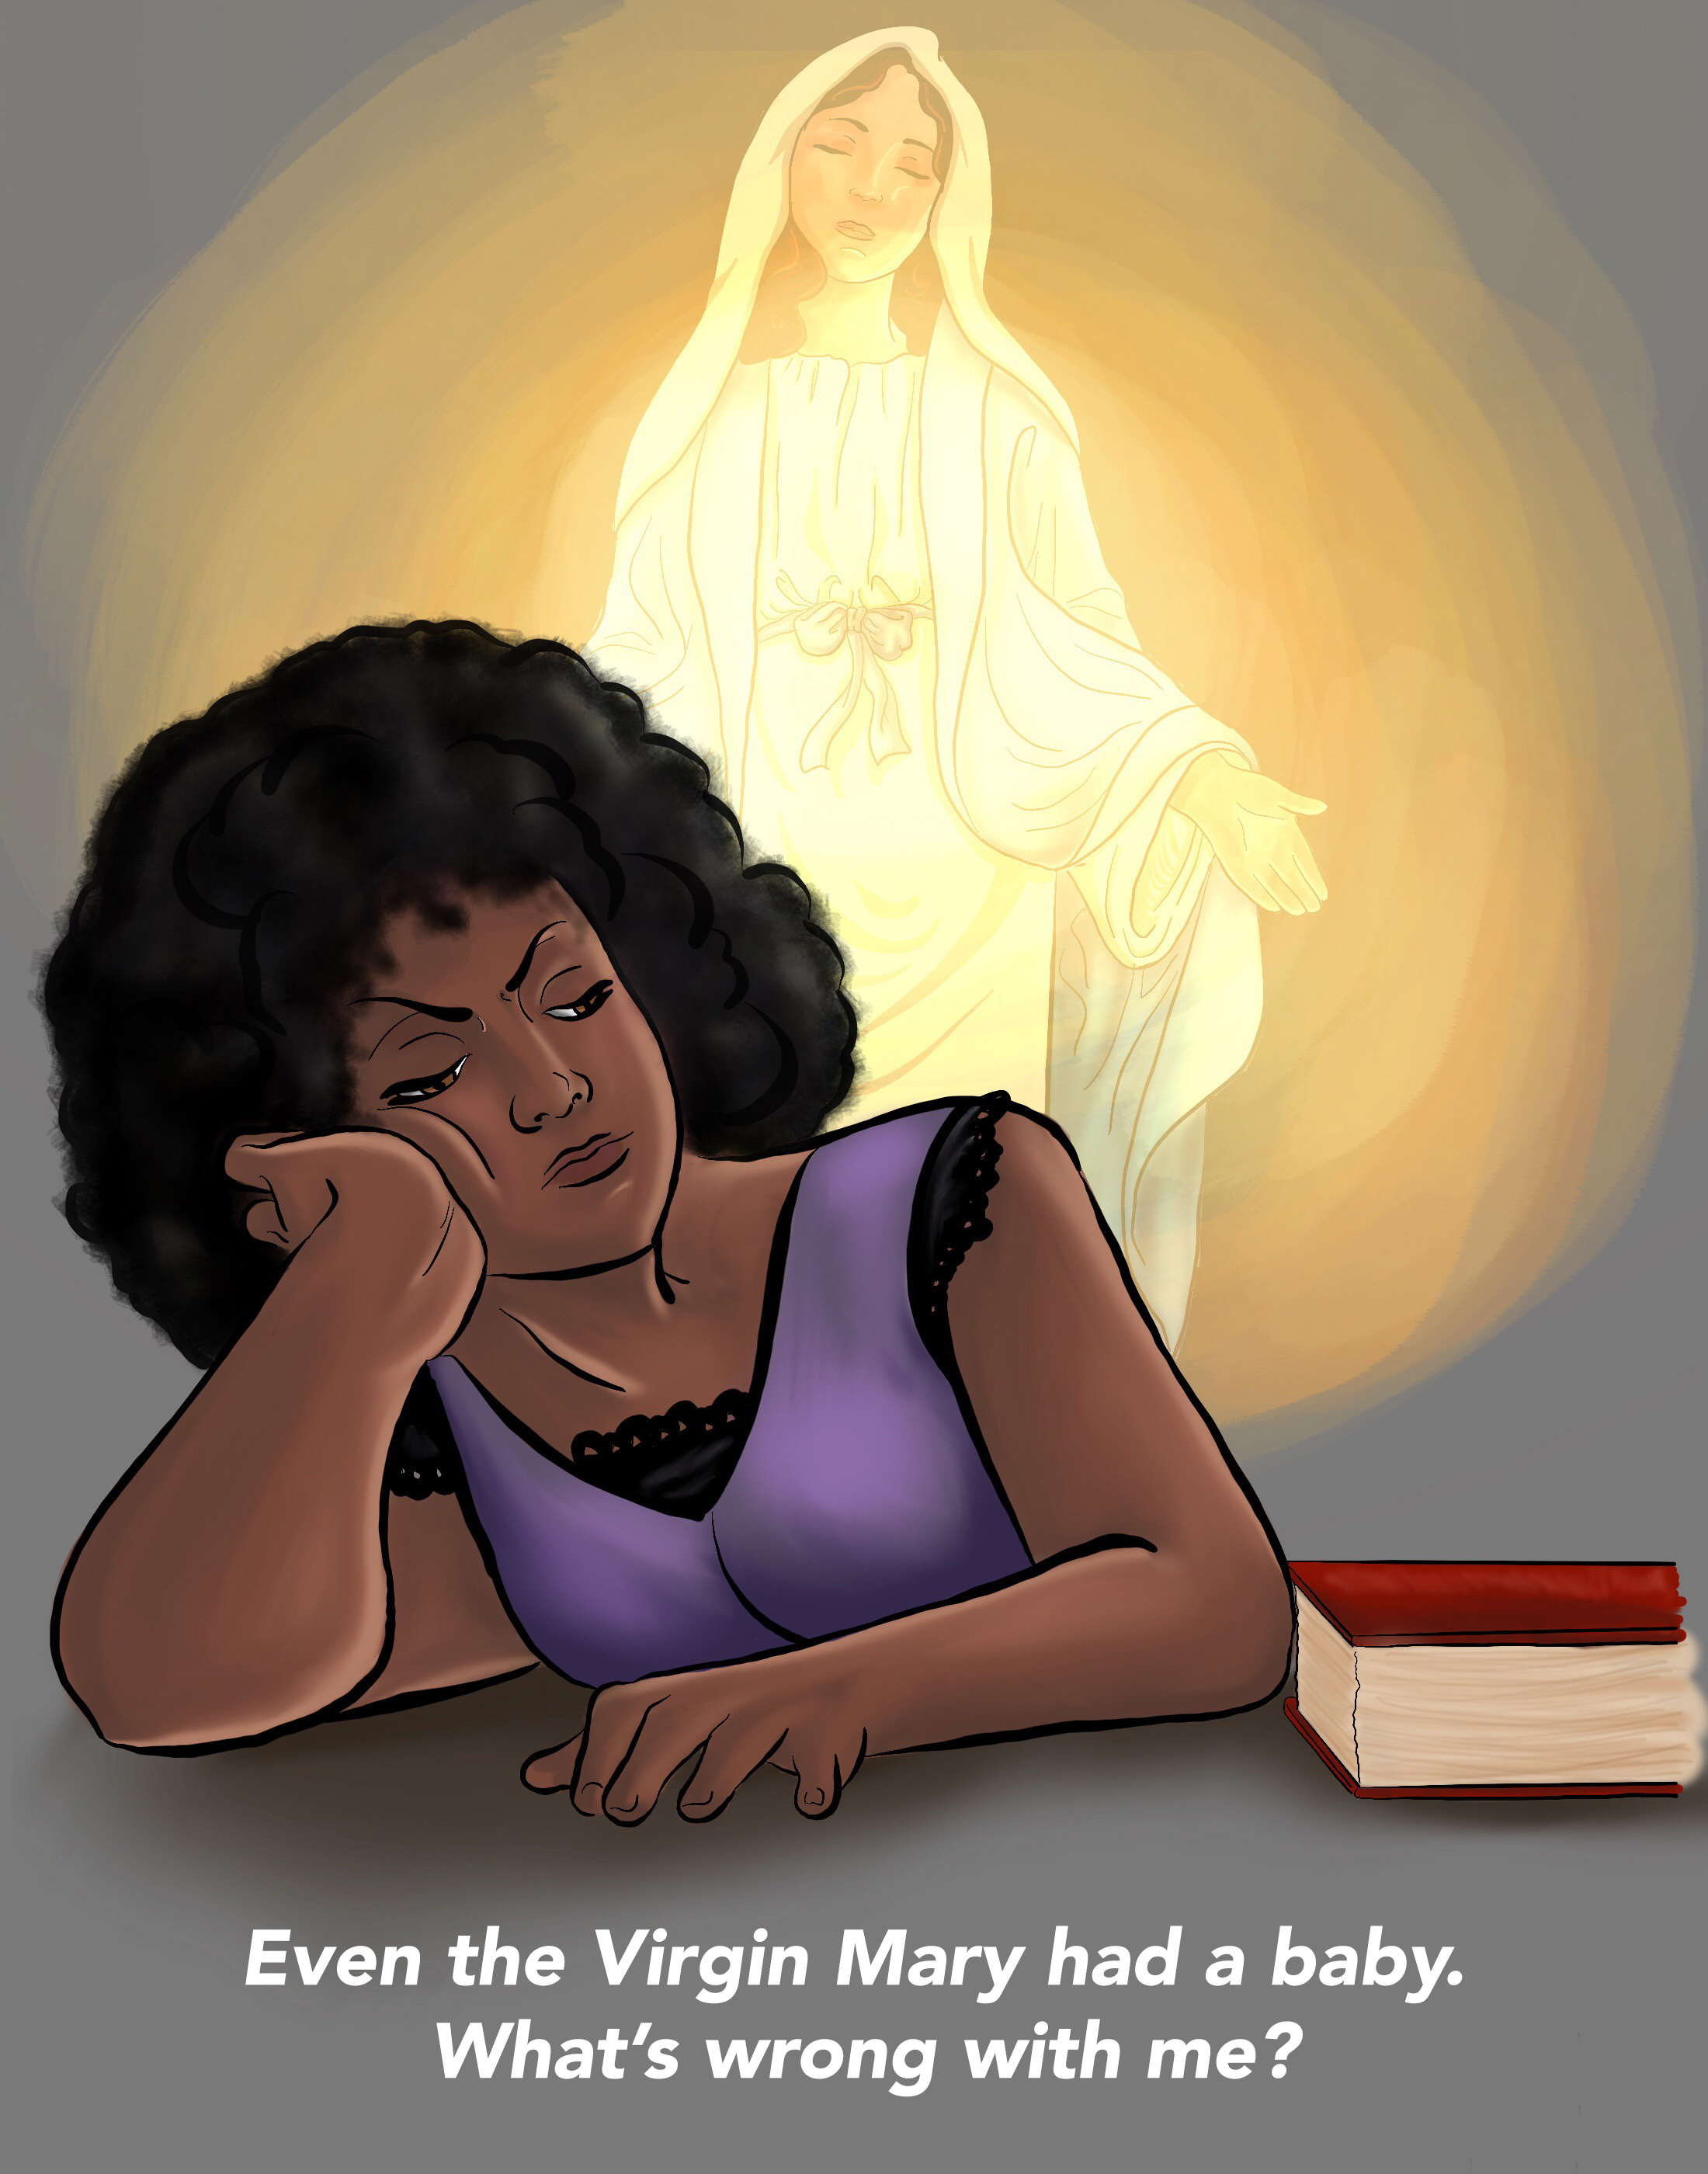 In-Fertility & Friendship Cards: Imagined by Sue Johnston www.theinfertilityadvocate.com Illustrated by Madeleine Kimble www.ByMadeleineKimble.com